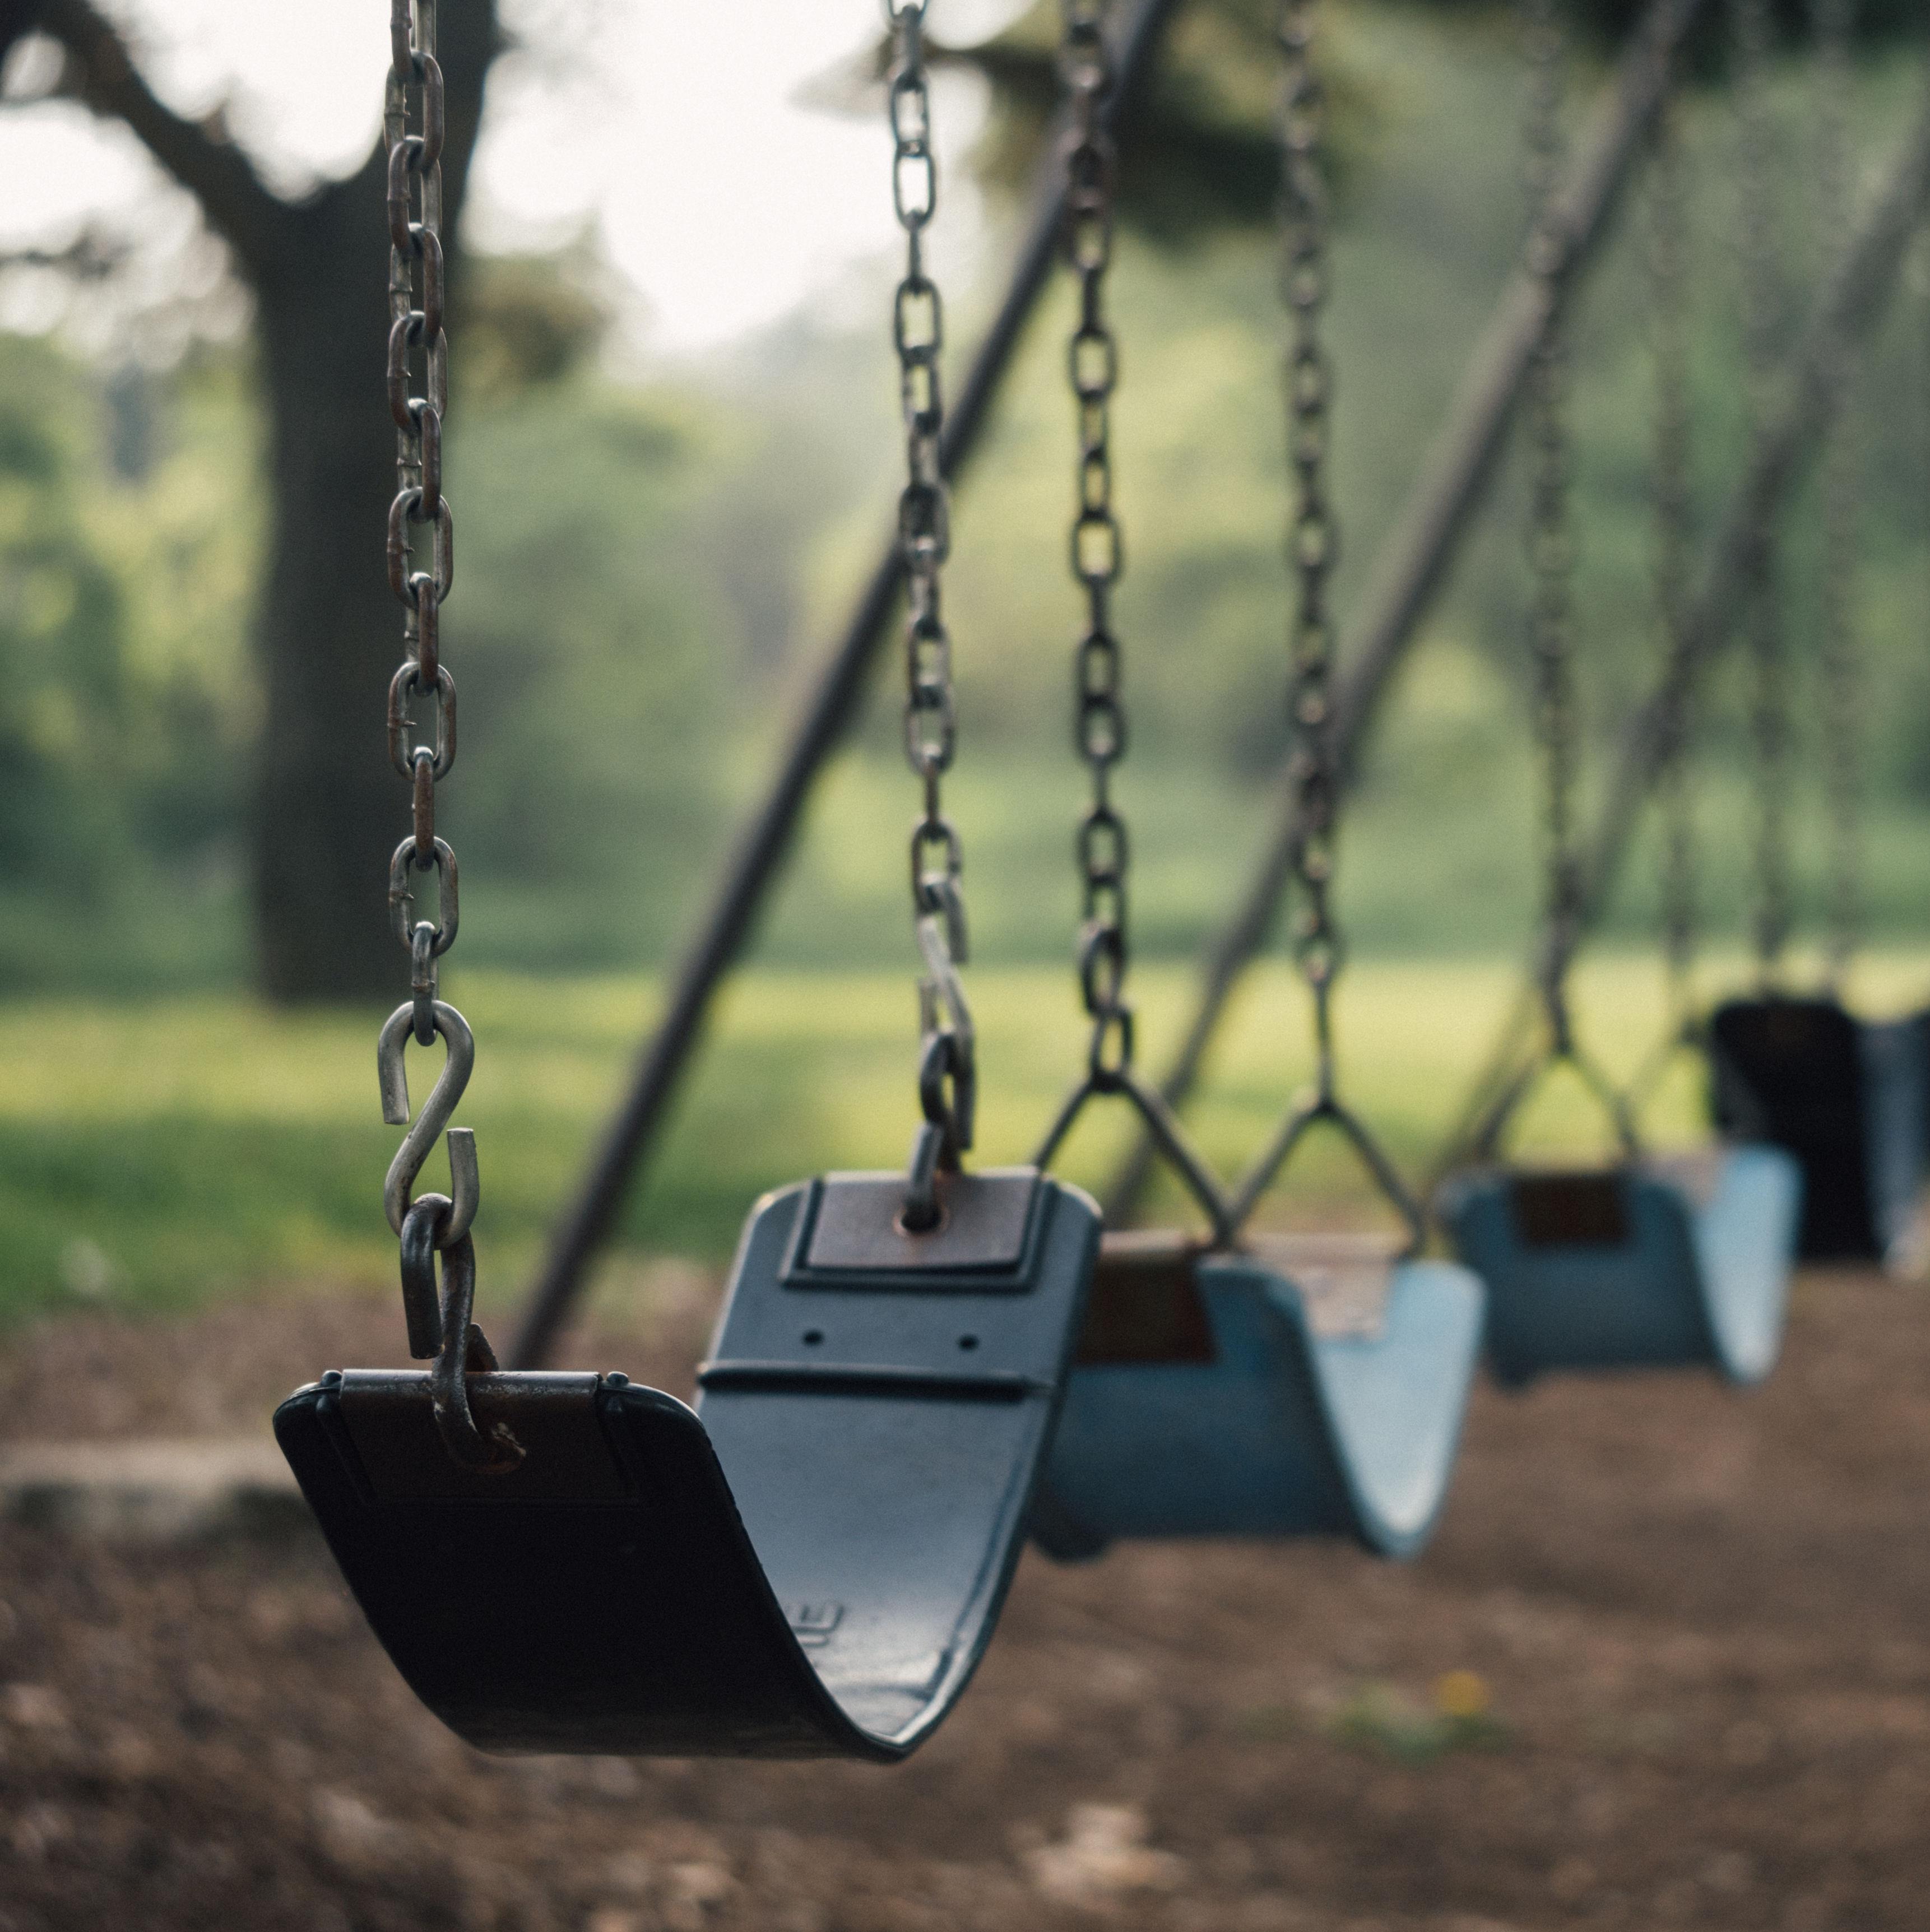 Playground gnnik8